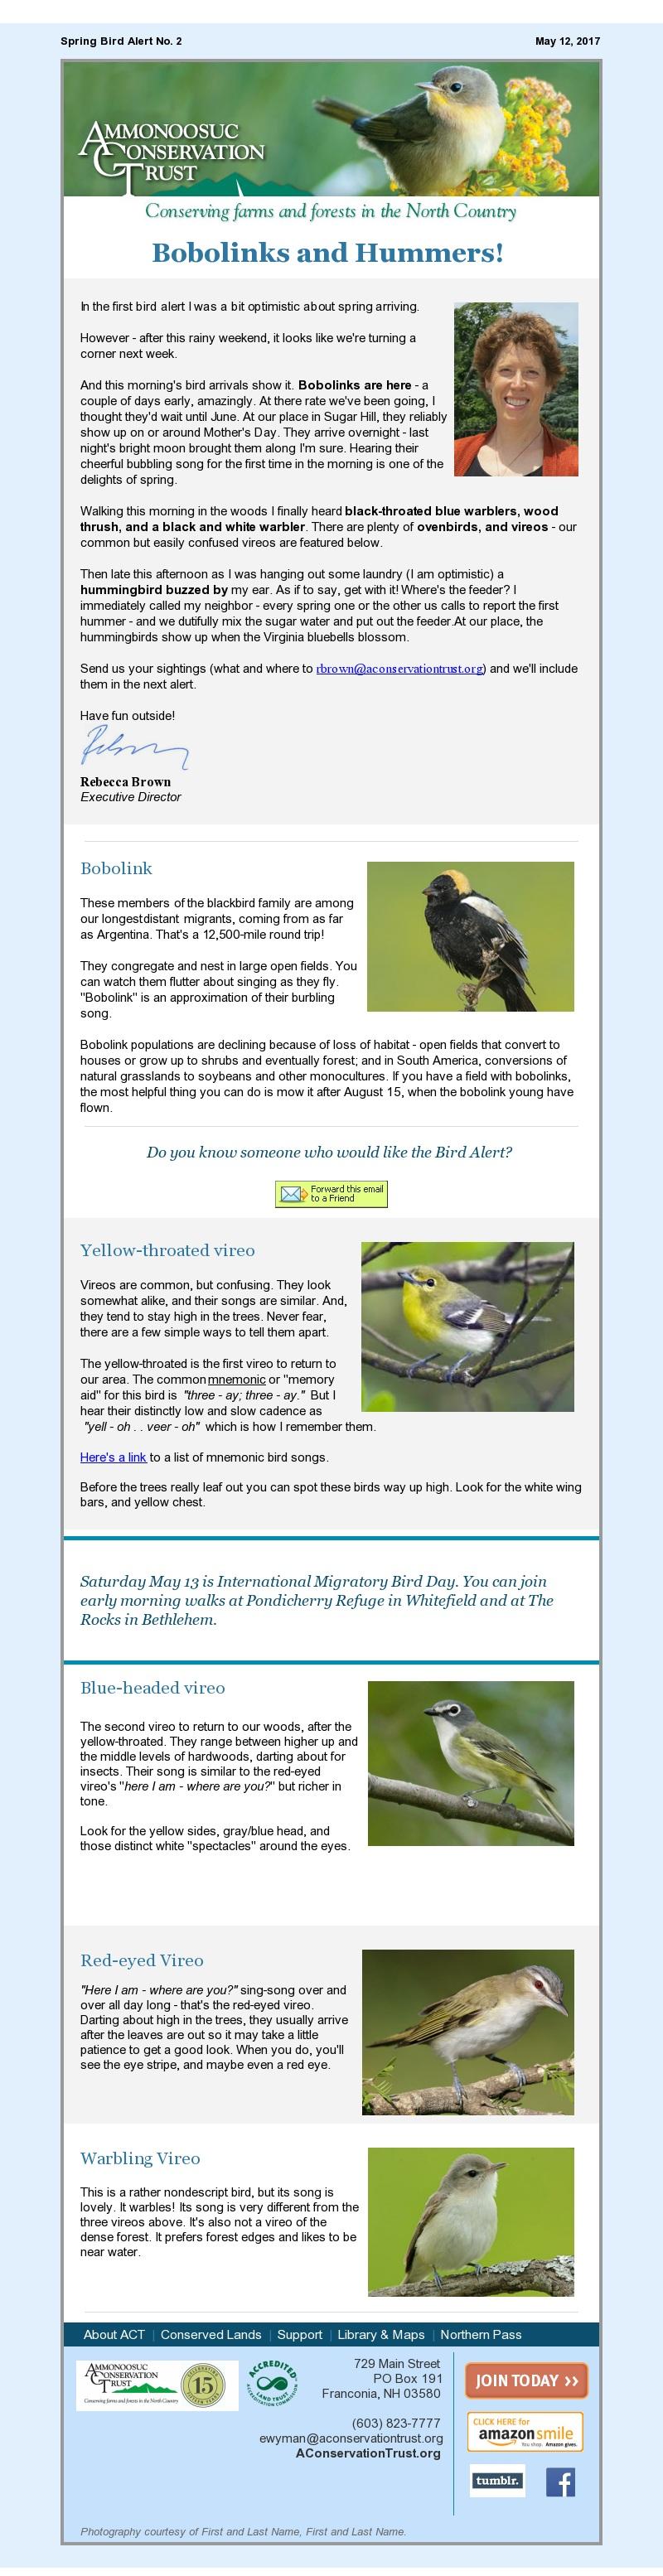 Bird Alert 2 2017 May 12.jpg